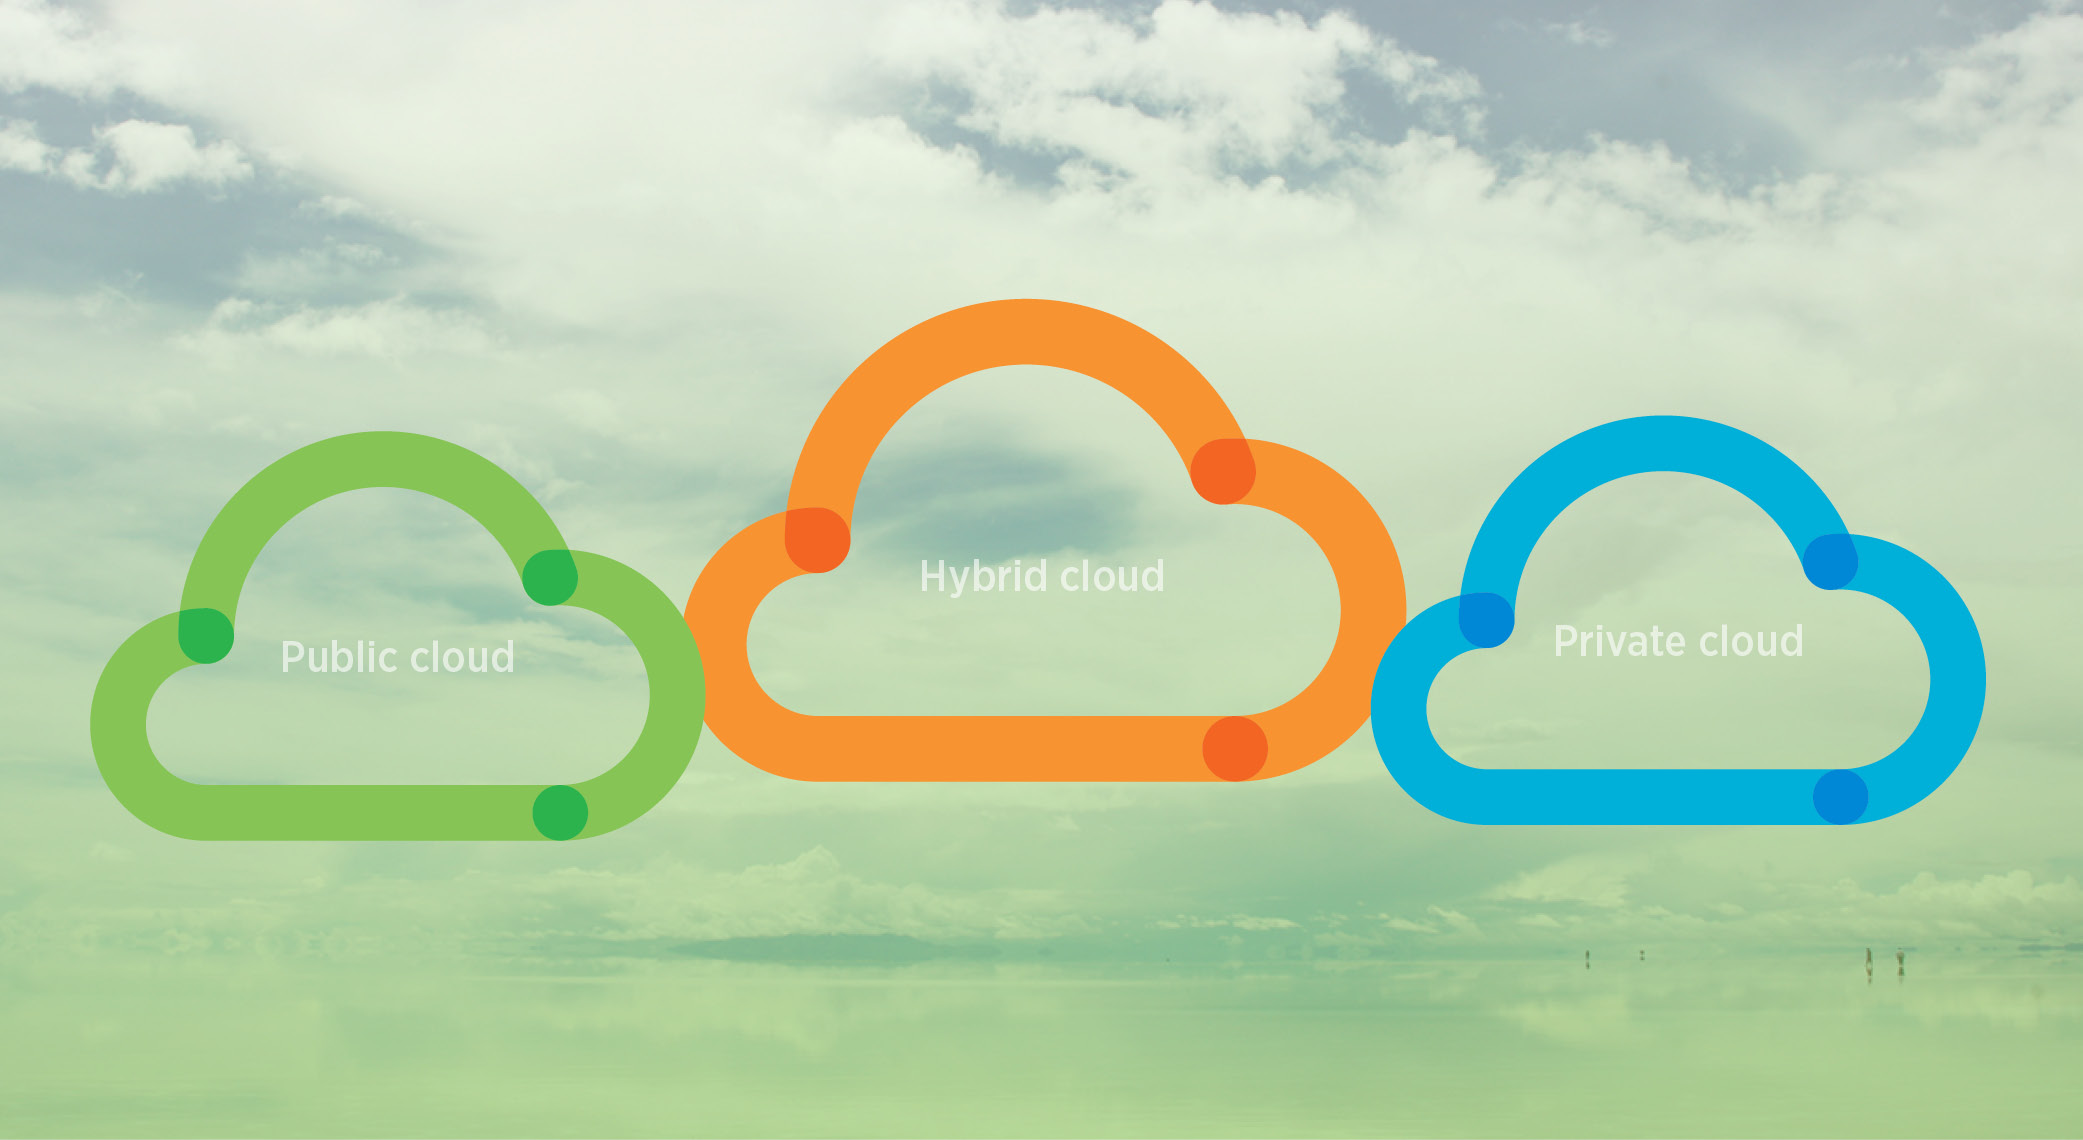 Kind of cloud